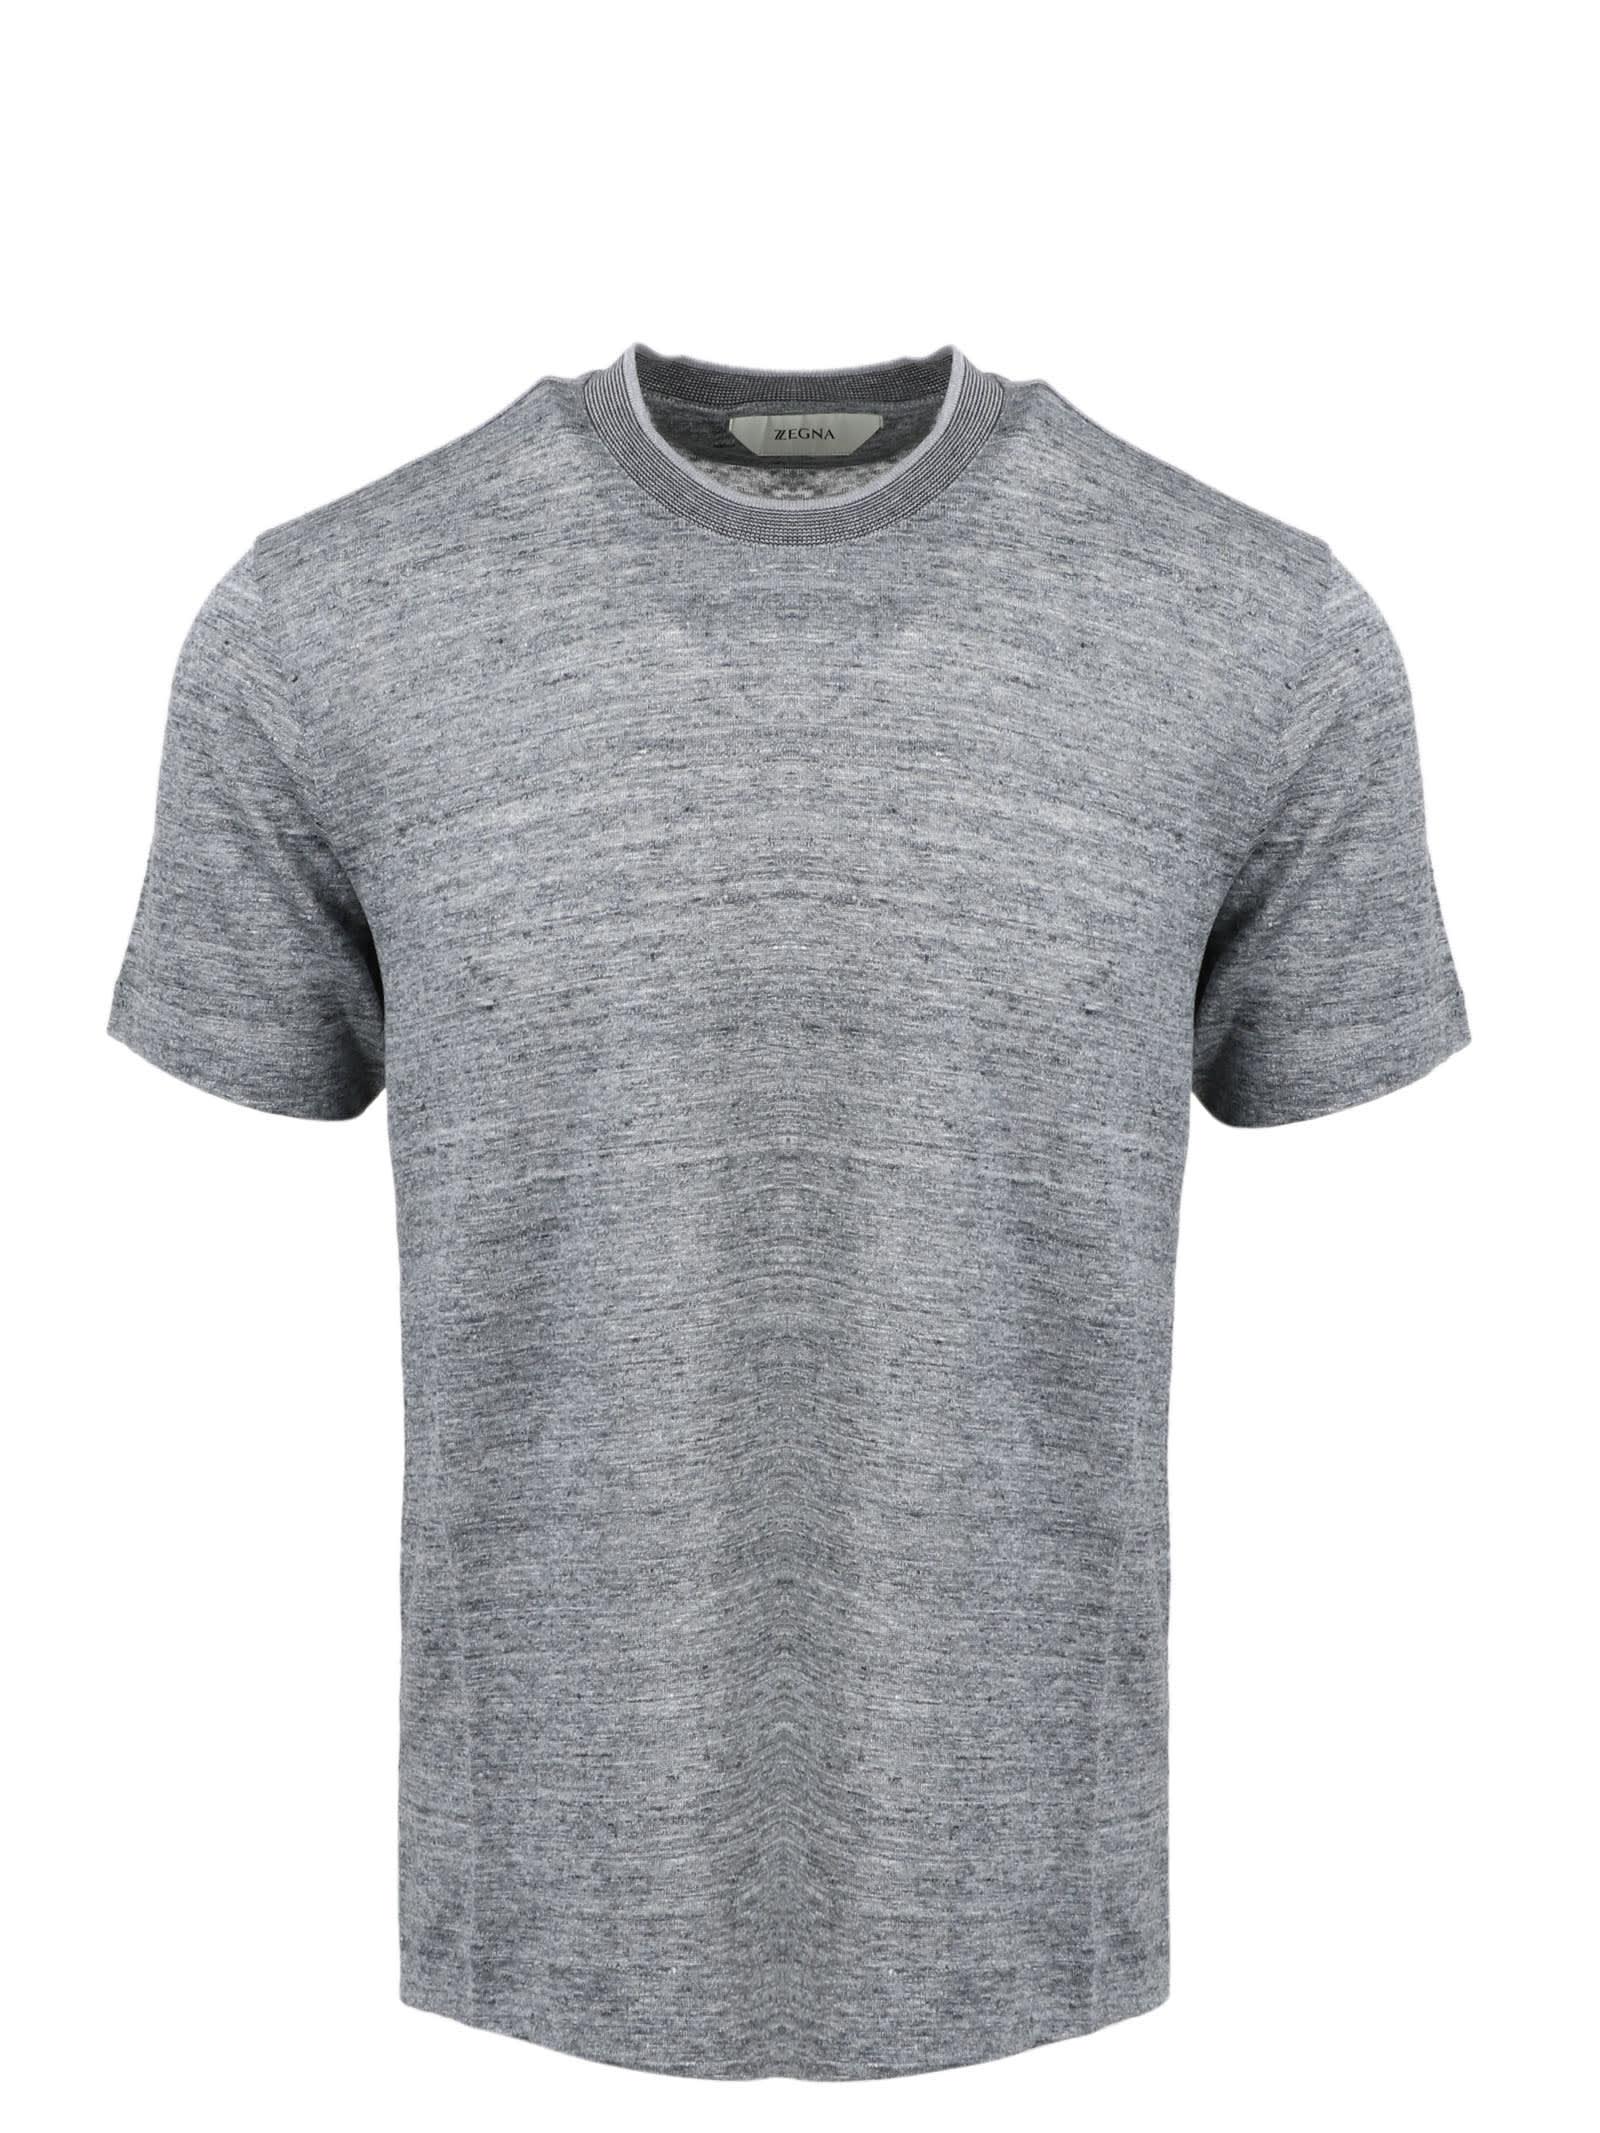 Melange Linen T-shirt